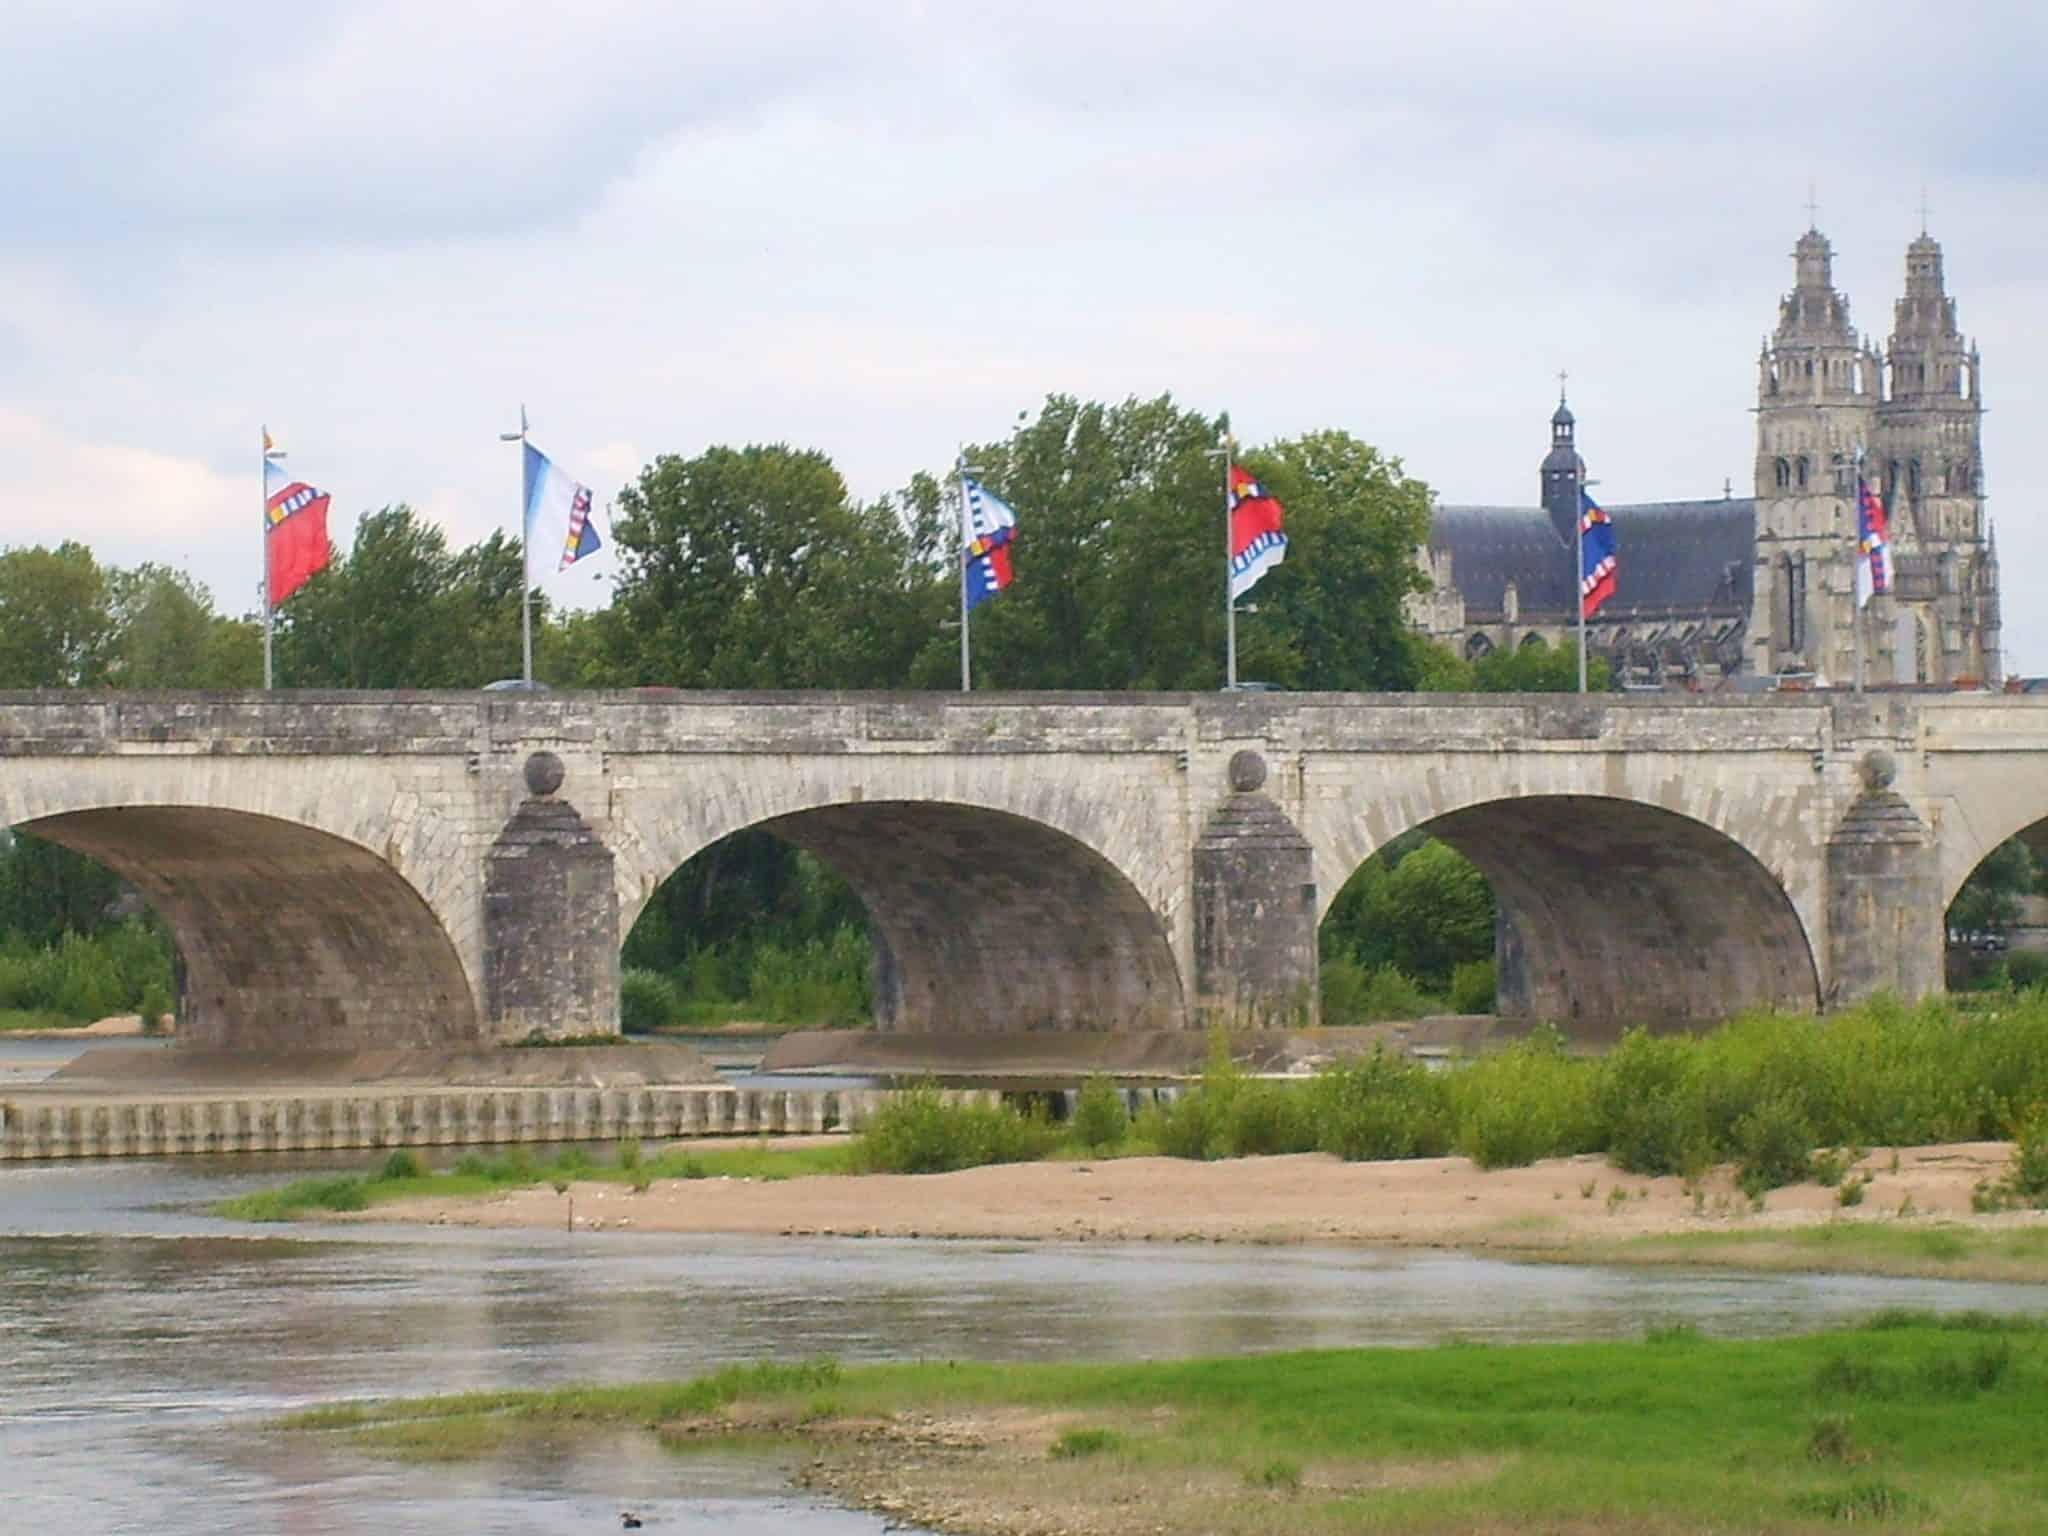 Loirestreek Frankrijk: Top 8 steden en bezienswaardigheden - Mamaliefde.nl